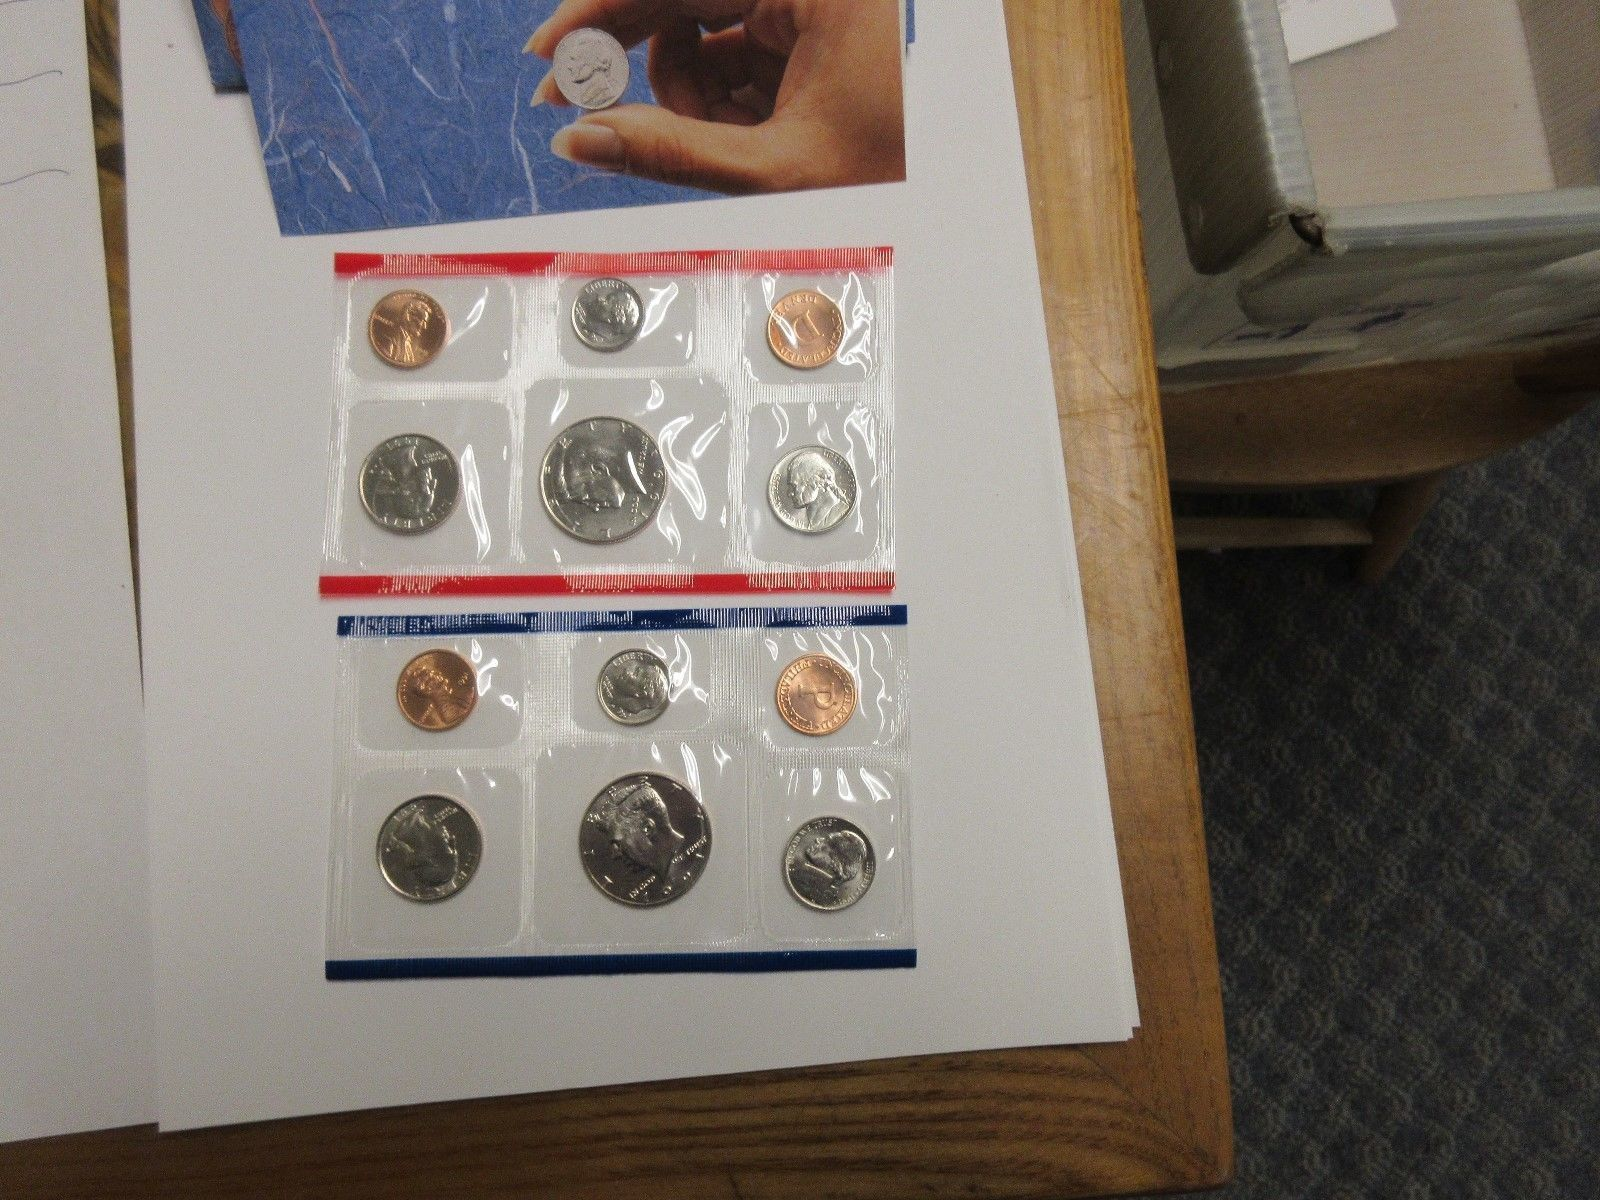 1991 , United States Mint , Uncirculated Mint Set , Lot of 5 Sets image 6